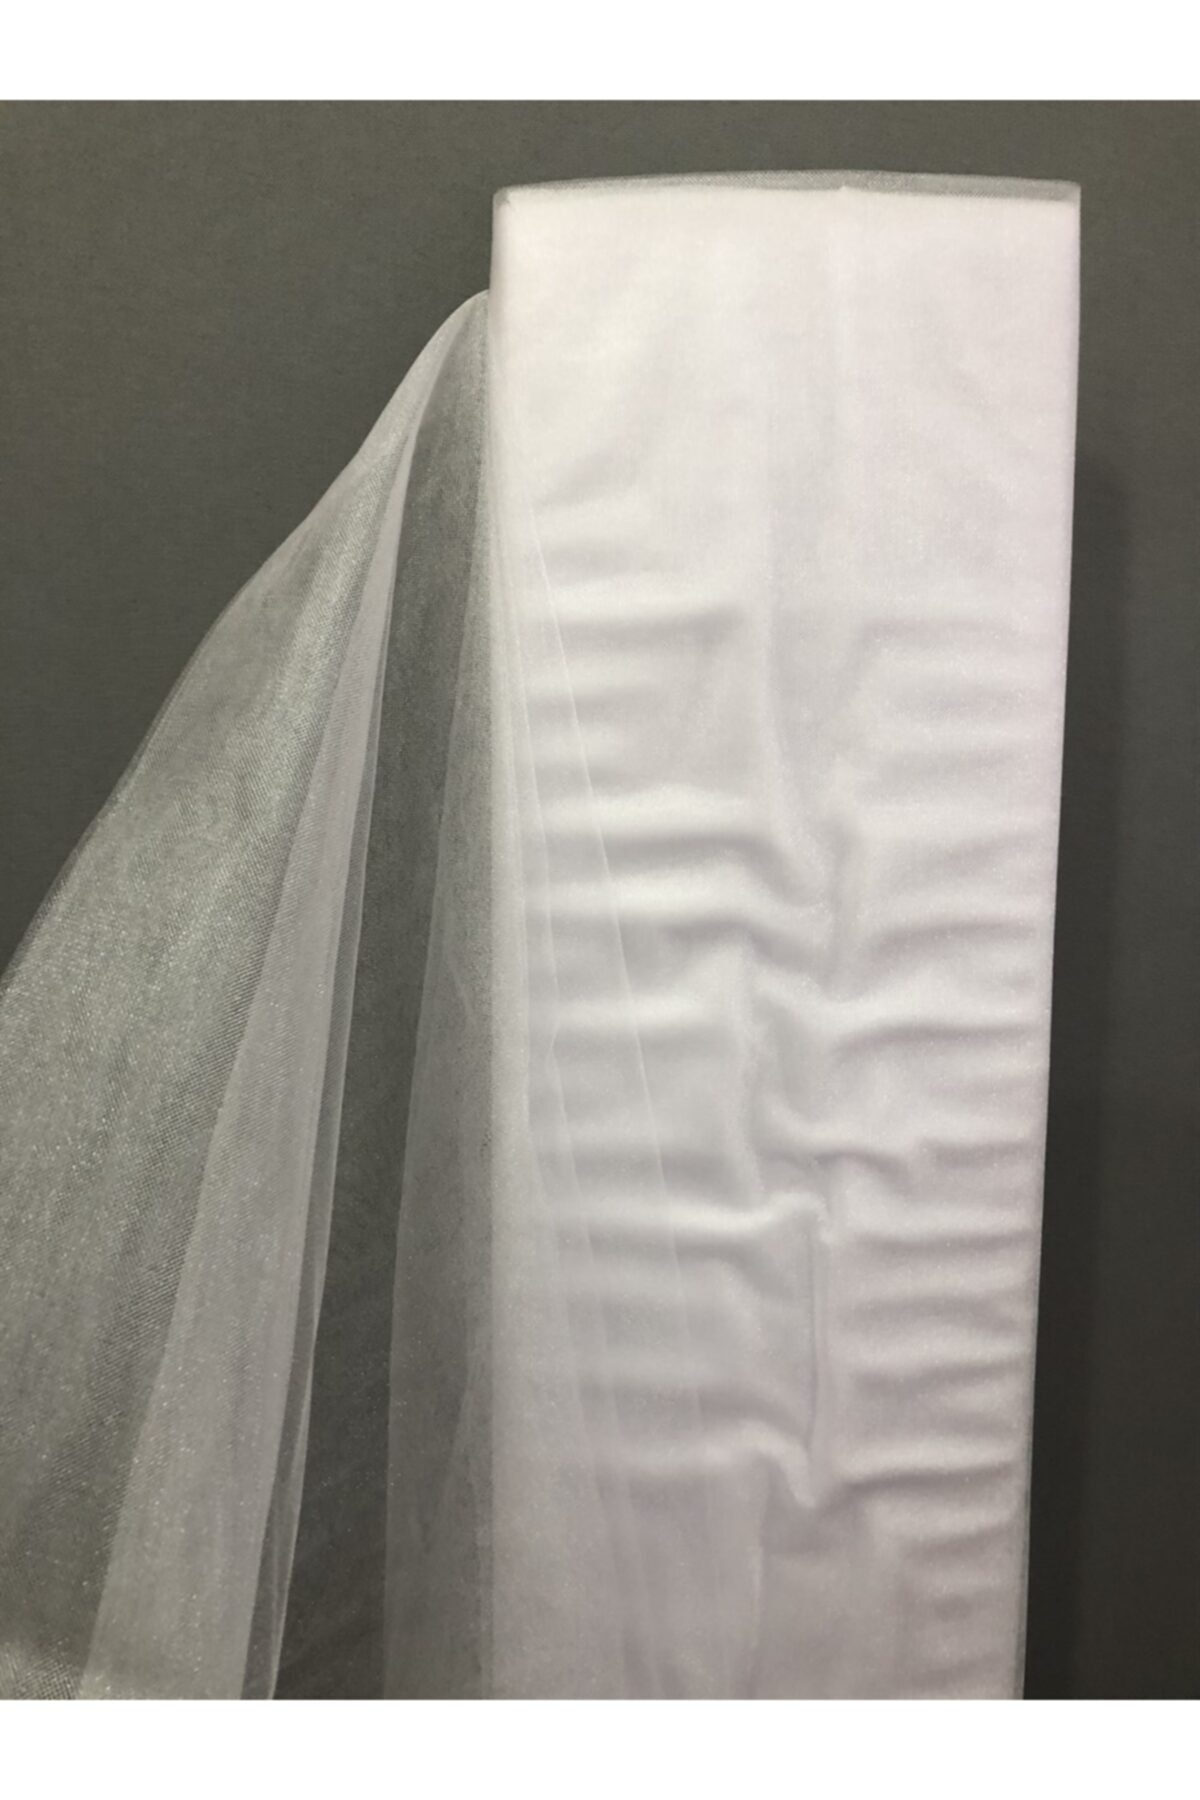 Beyaz Kristal Tül en 3 mt Boy 1 mt